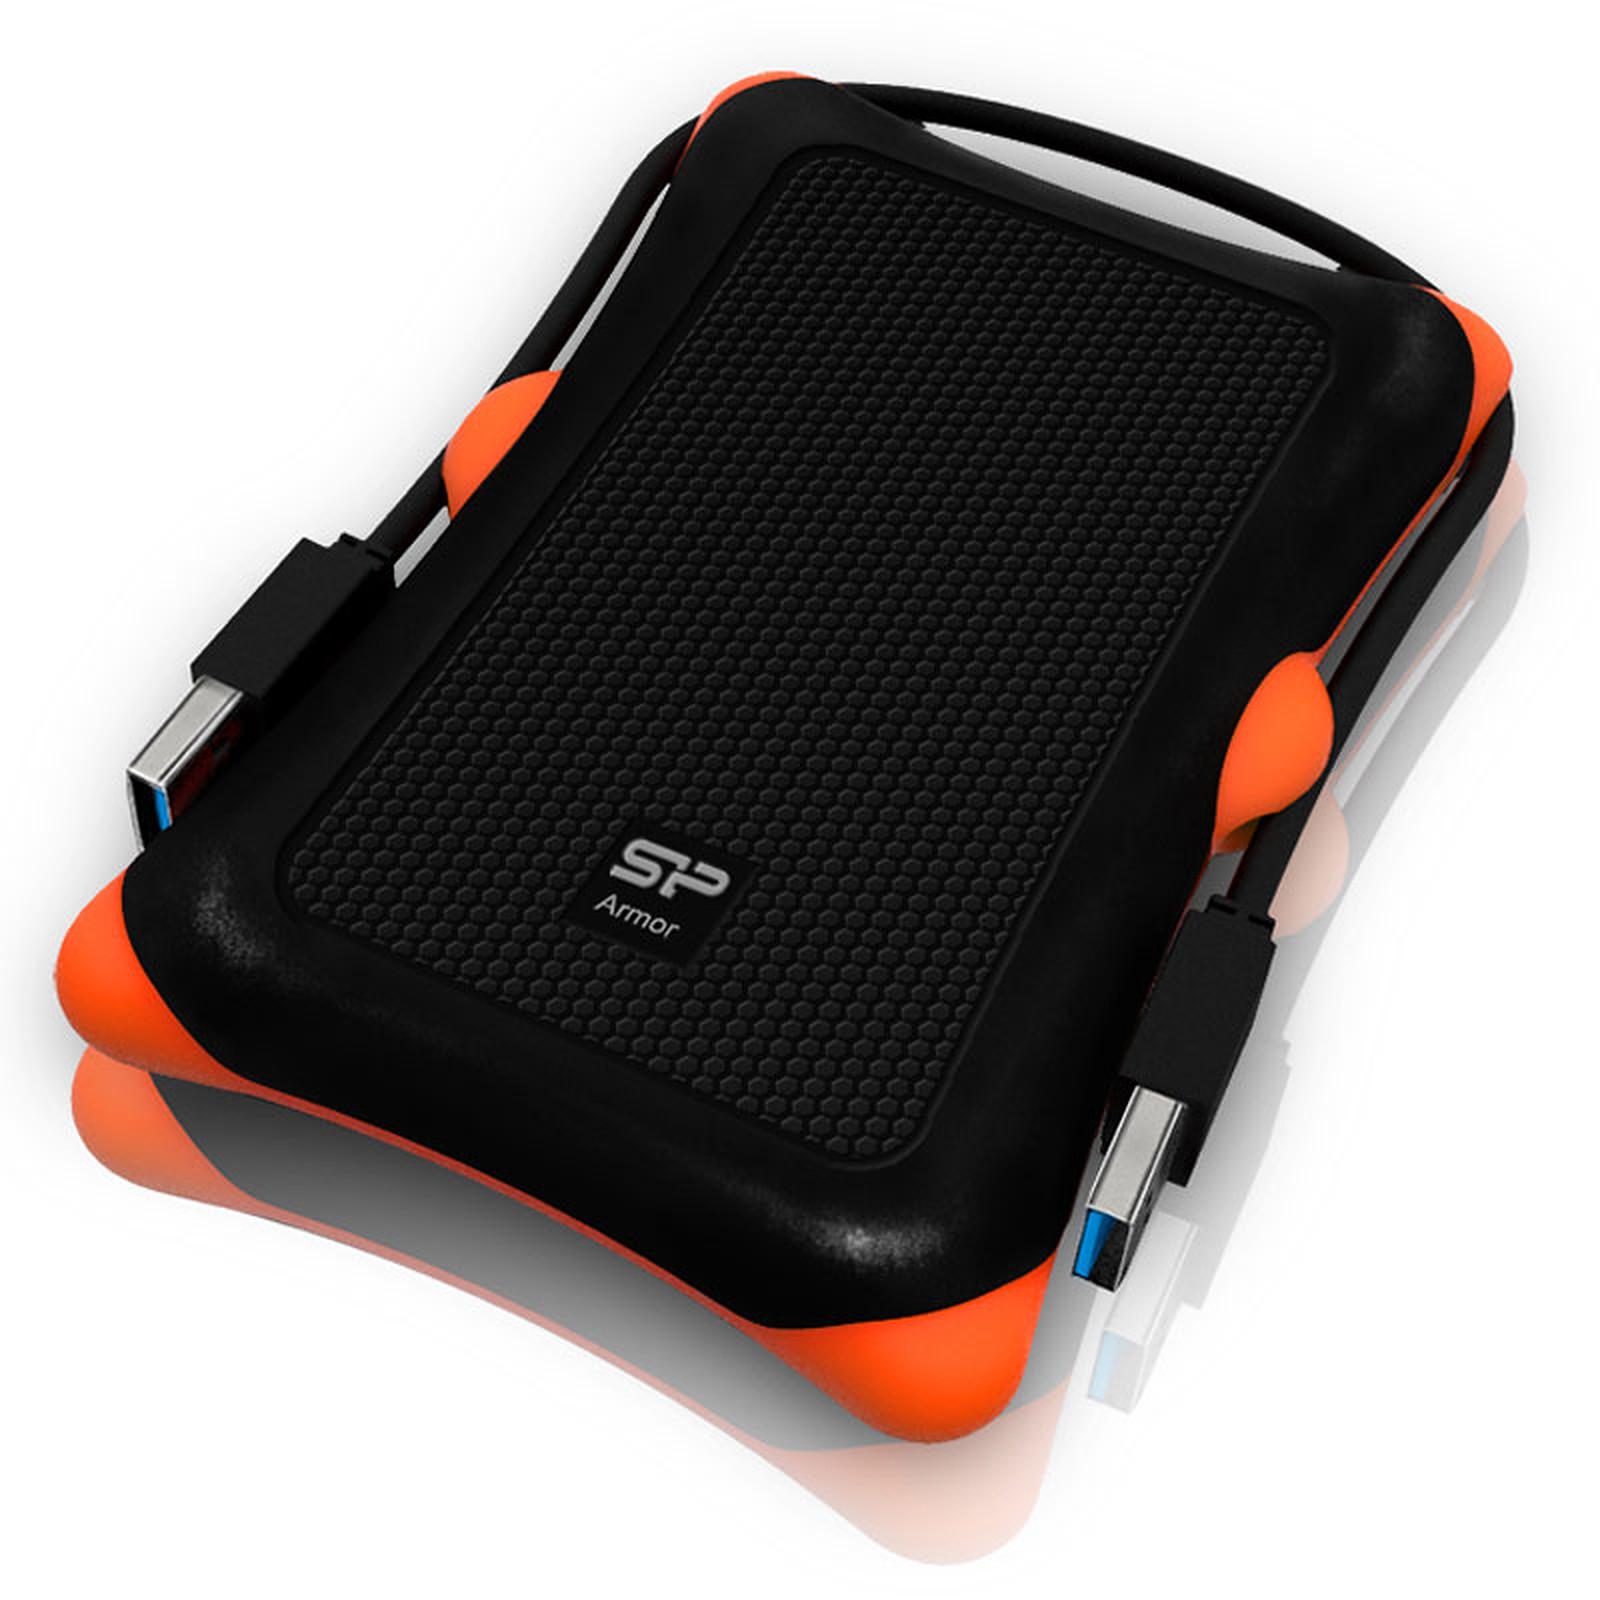 "LDLC SSD Externe 2.5"" USB 3.0 240 Go"